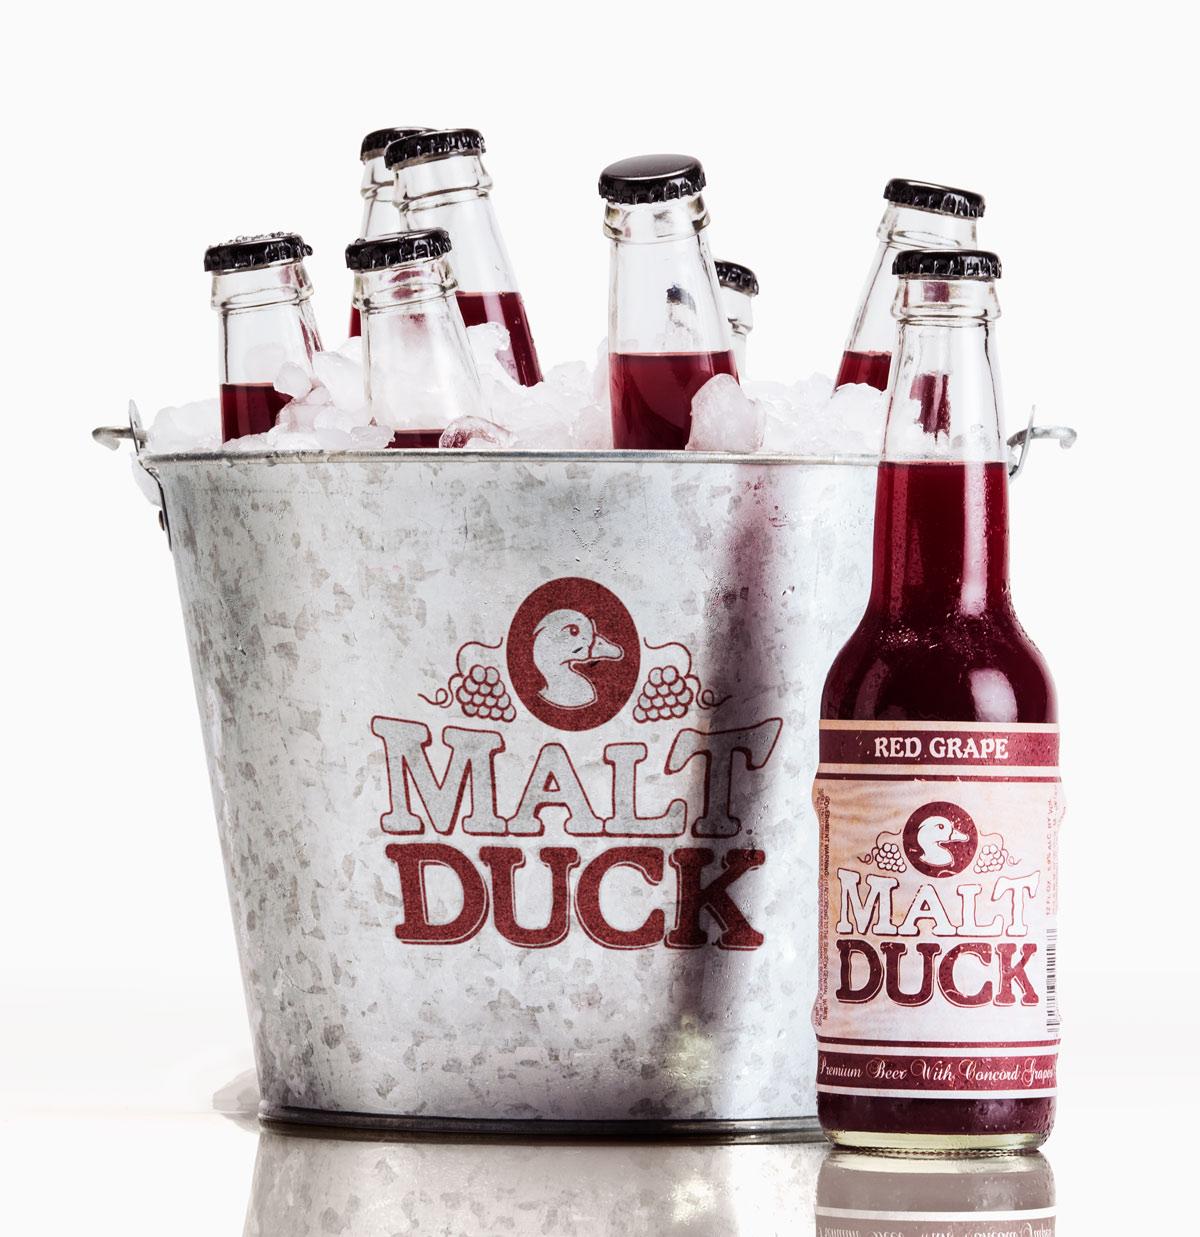 Sprecher Recreates Malt Duck With A Blend Of Premium Beer